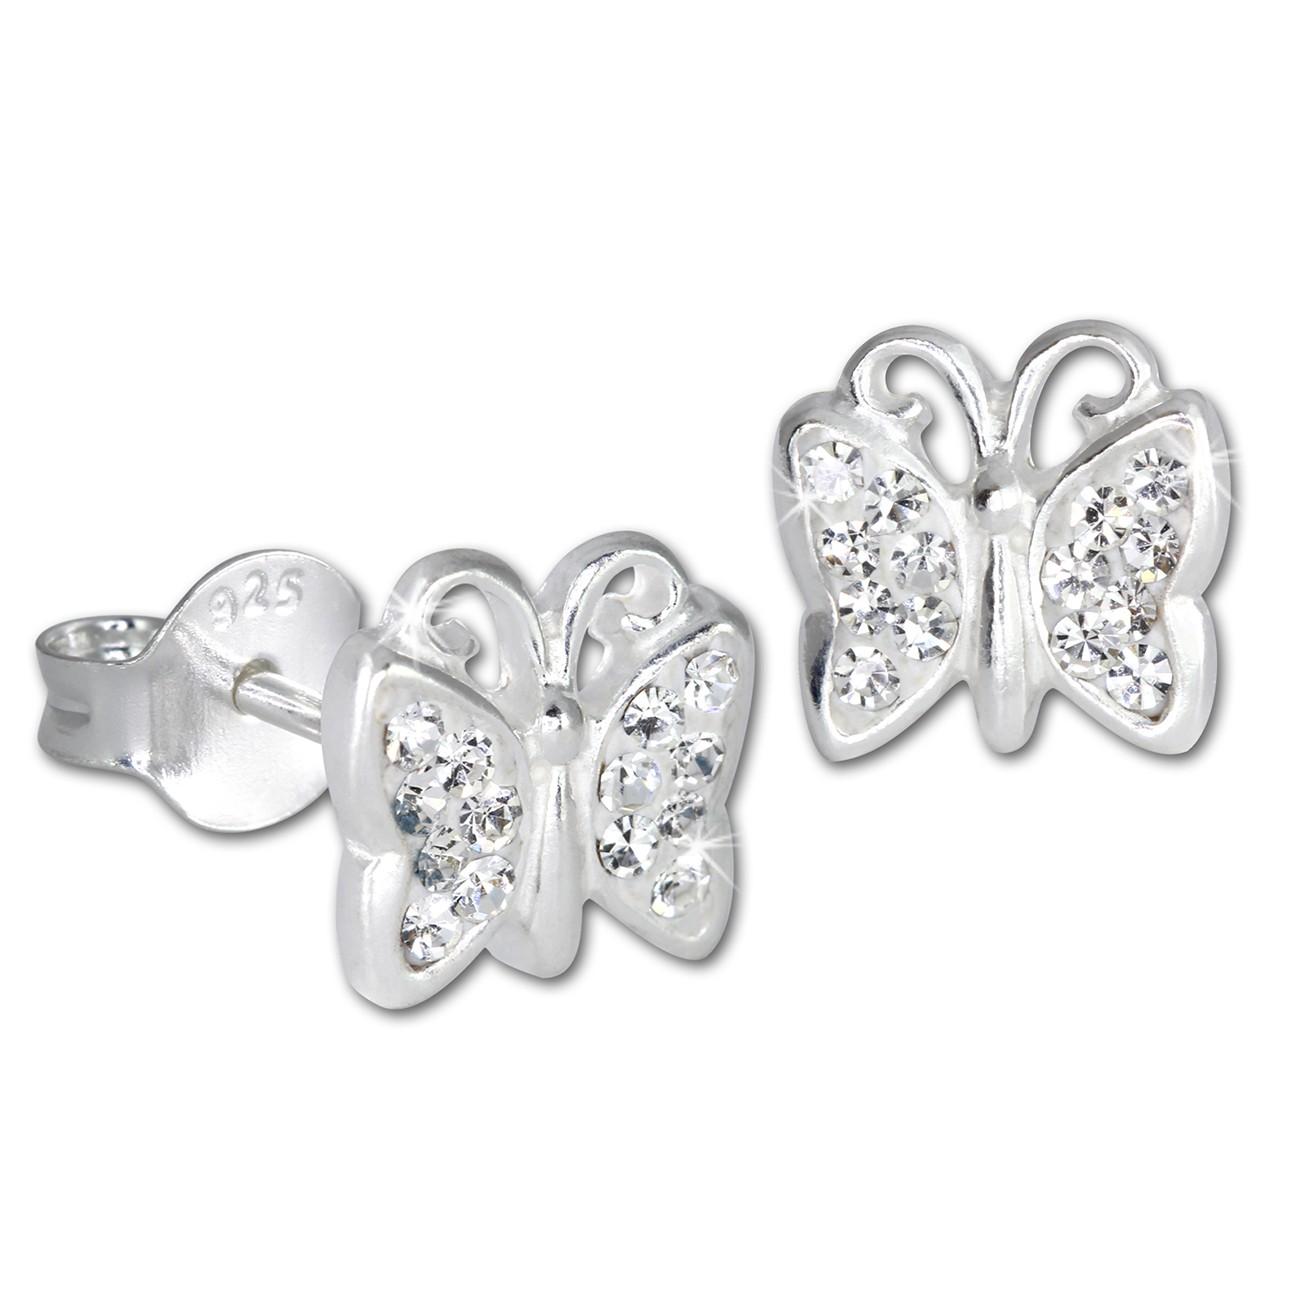 SilberDream Kinder Ohrringe Schmetterling Zirkonia weiß 925er SDO094W